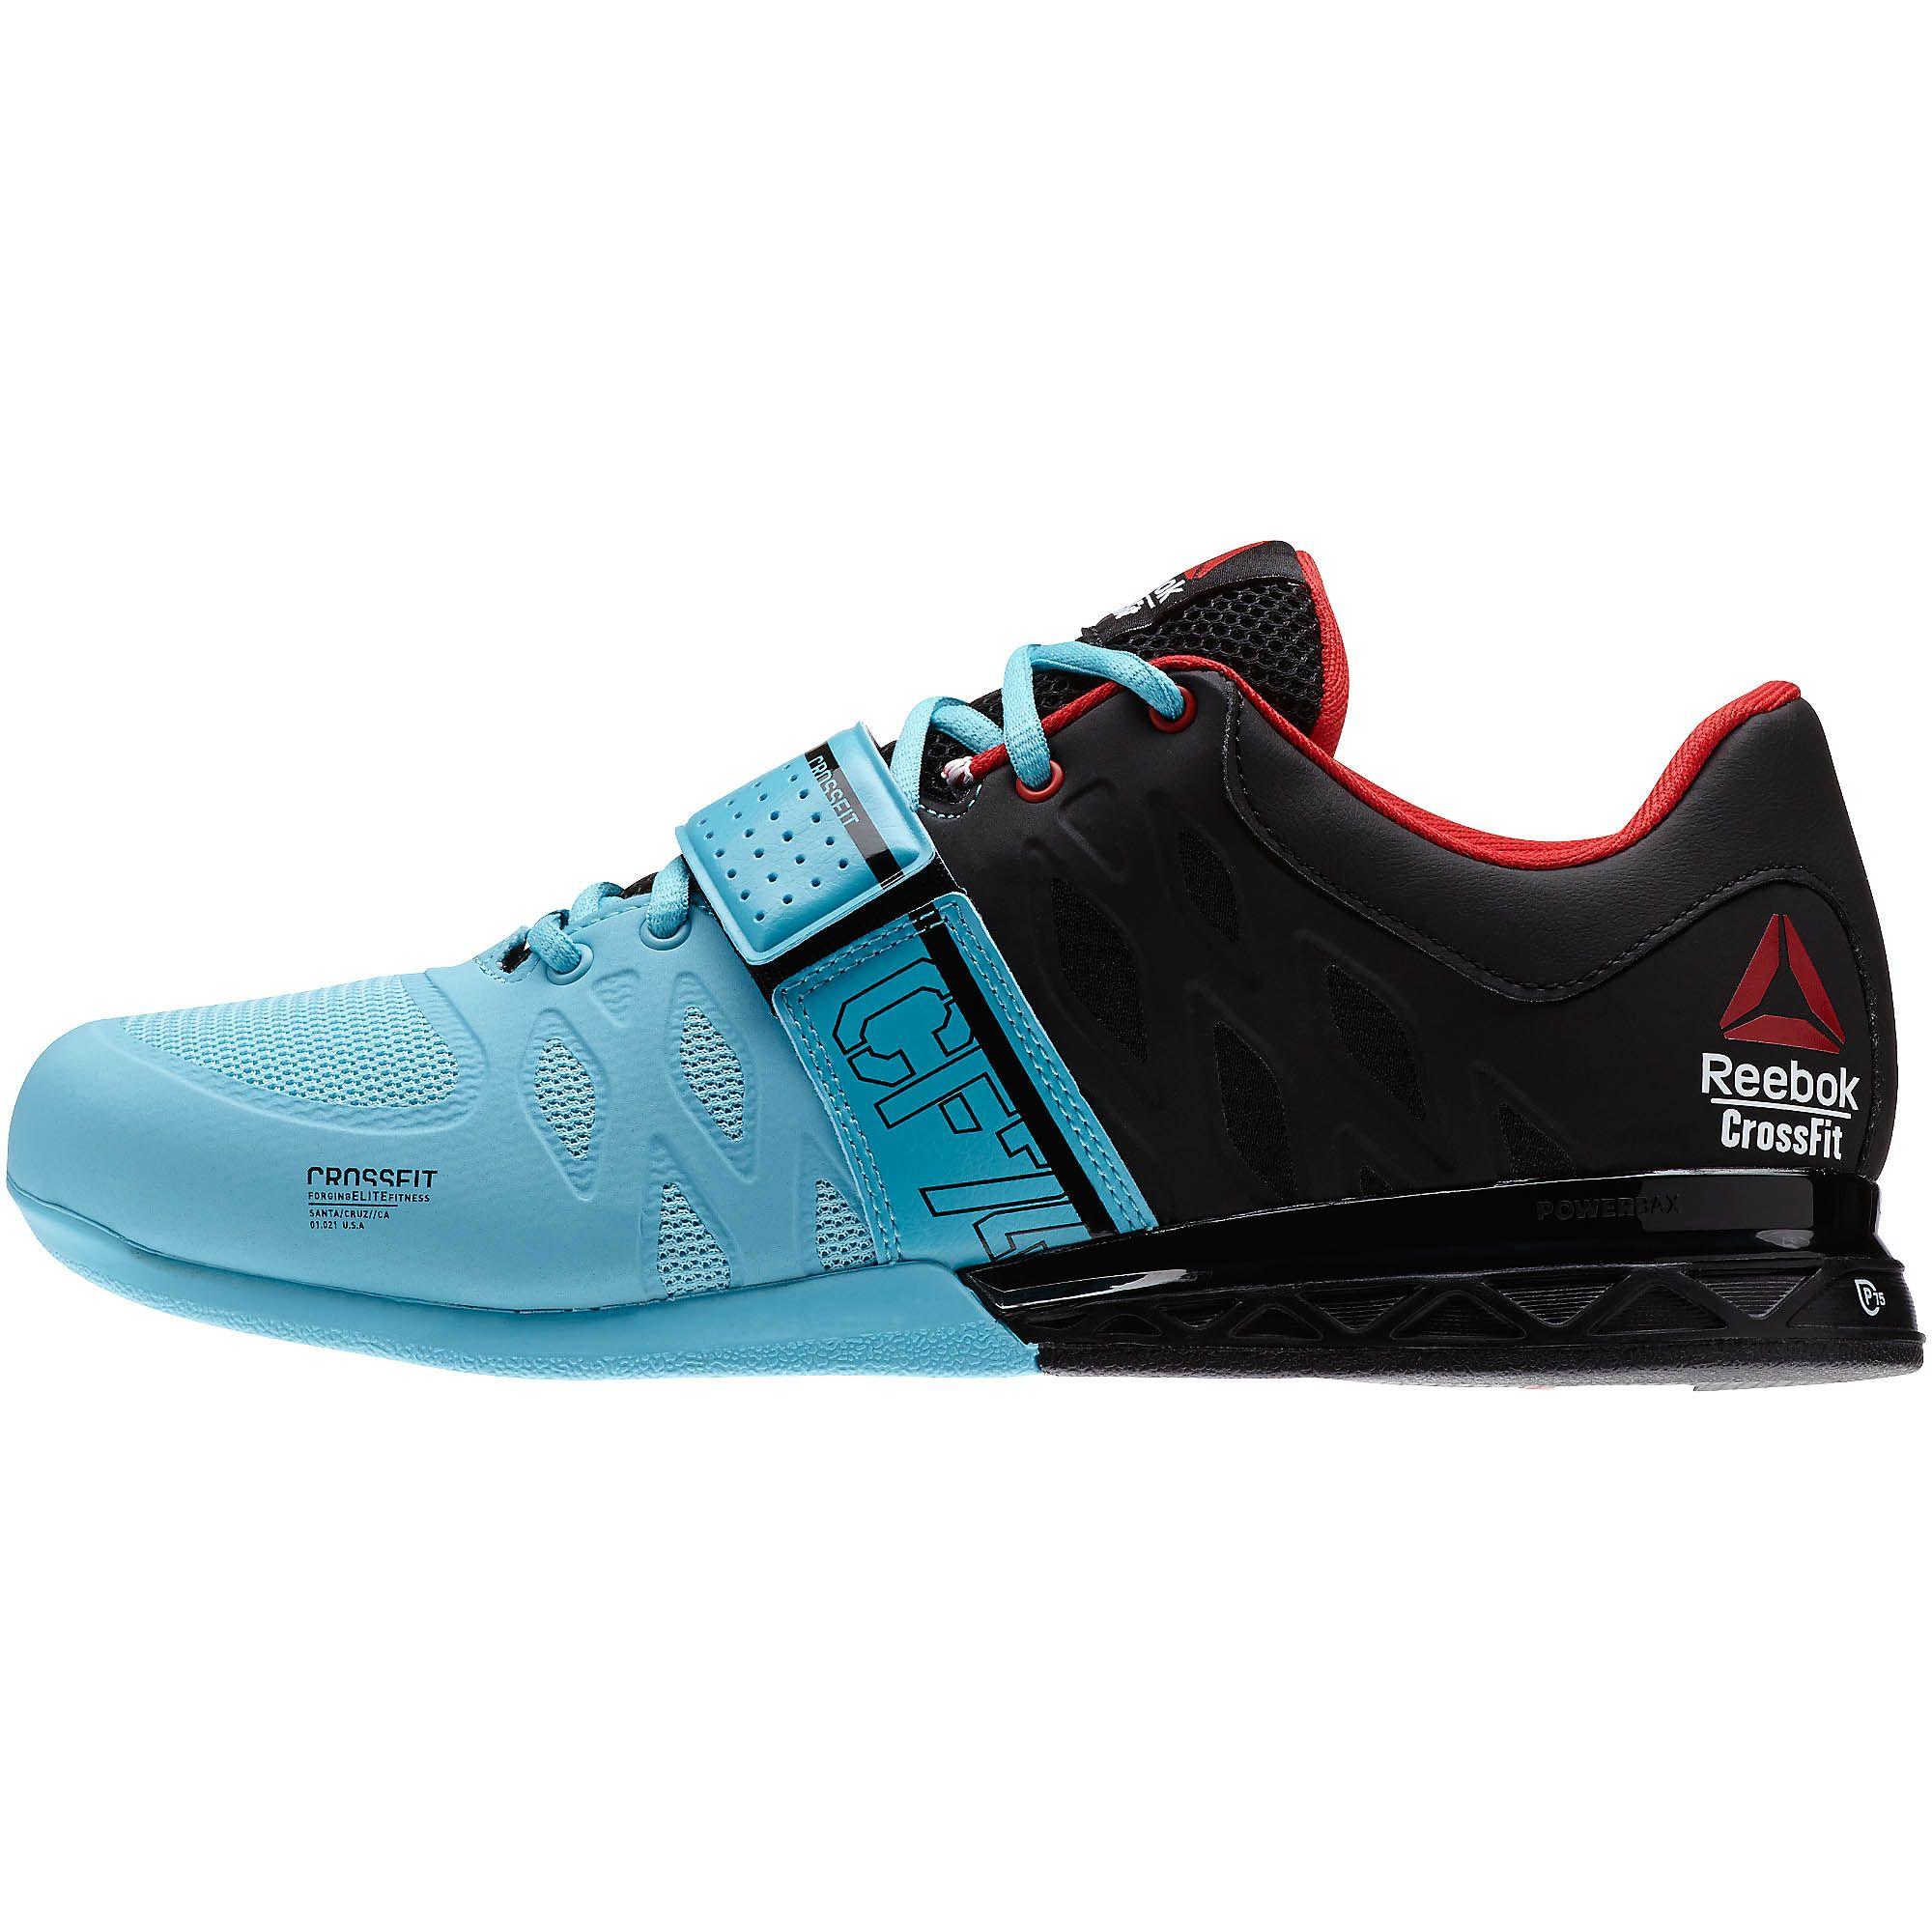 9c00727b2e7 reebok crossfit schoenen cheap > OFF52% The Largest Catalog Discounts